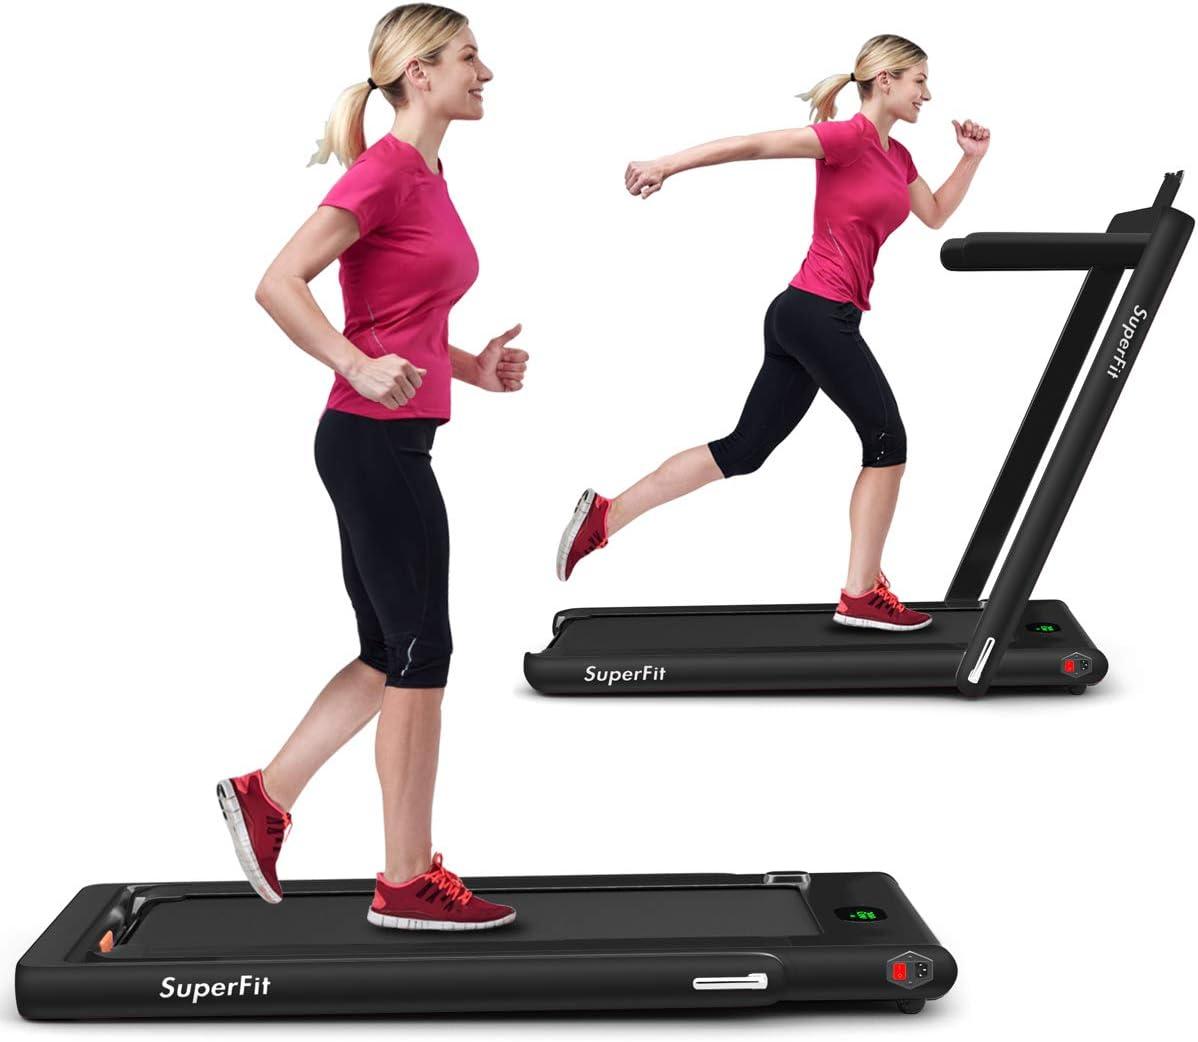 GYMAX 2 in 1 Folding Treadmill Desk NEW 2.25HP Electric Regular dealer T Pad Under